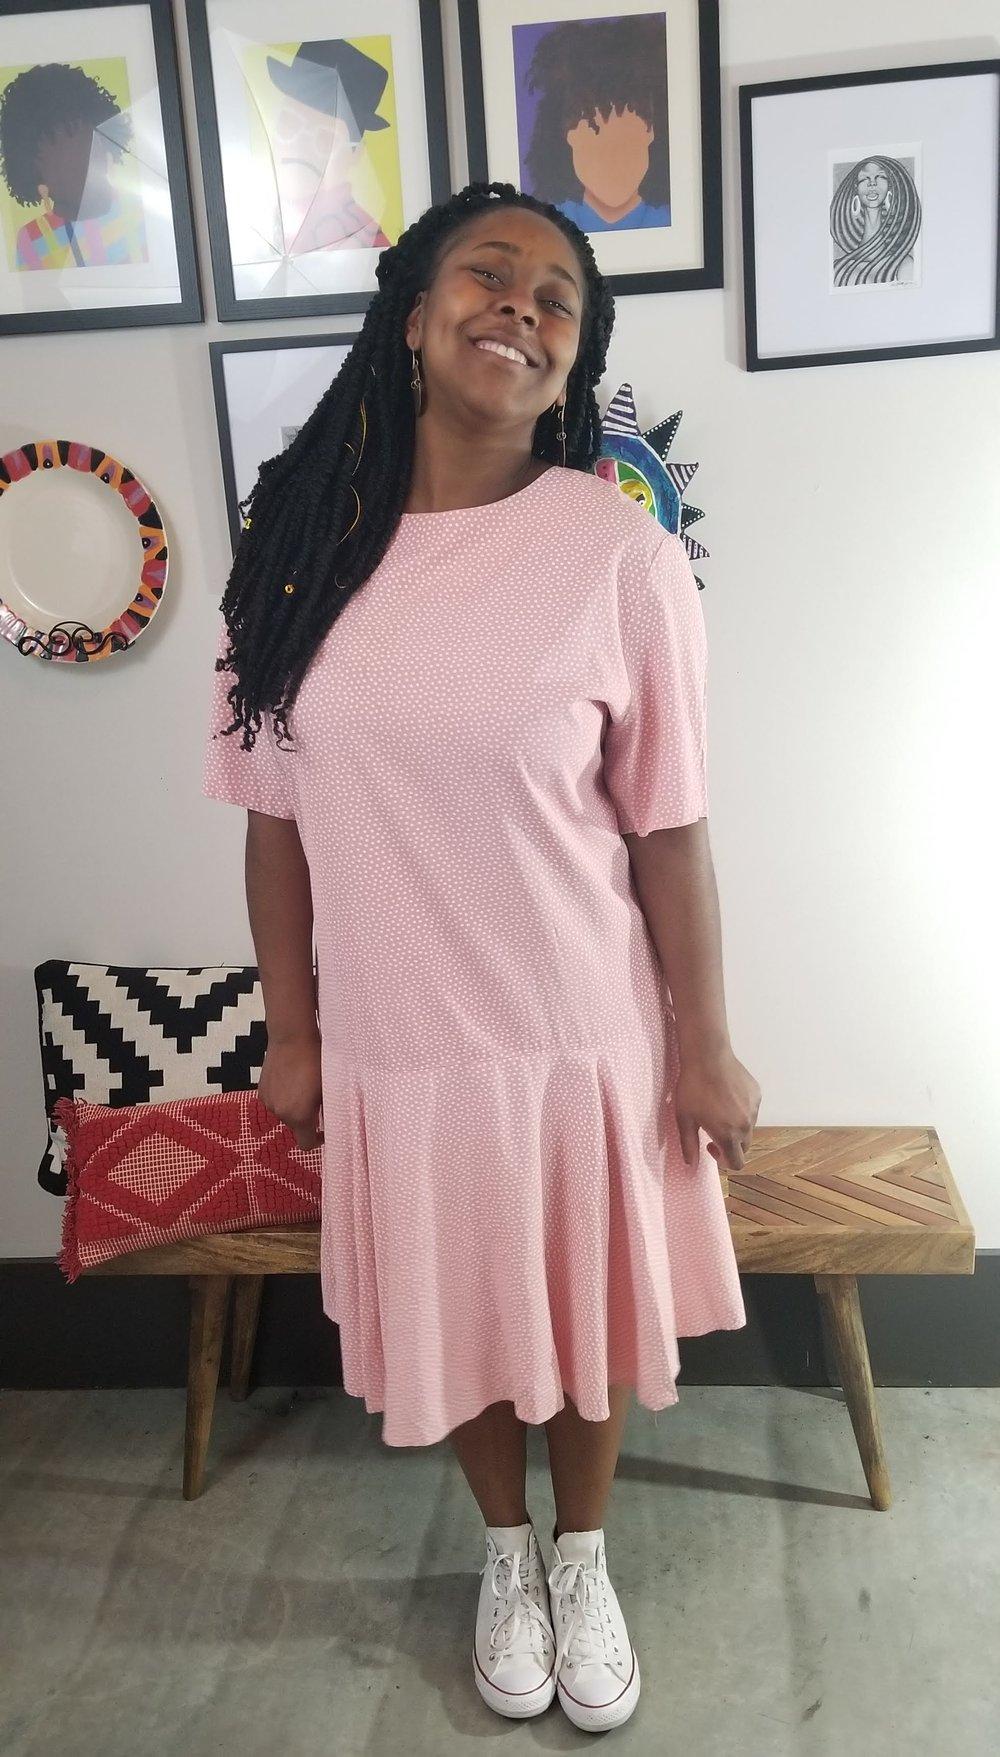 Image of 90's Drop Waist Pink Polka Dot Dress Women's Plus Size 2X